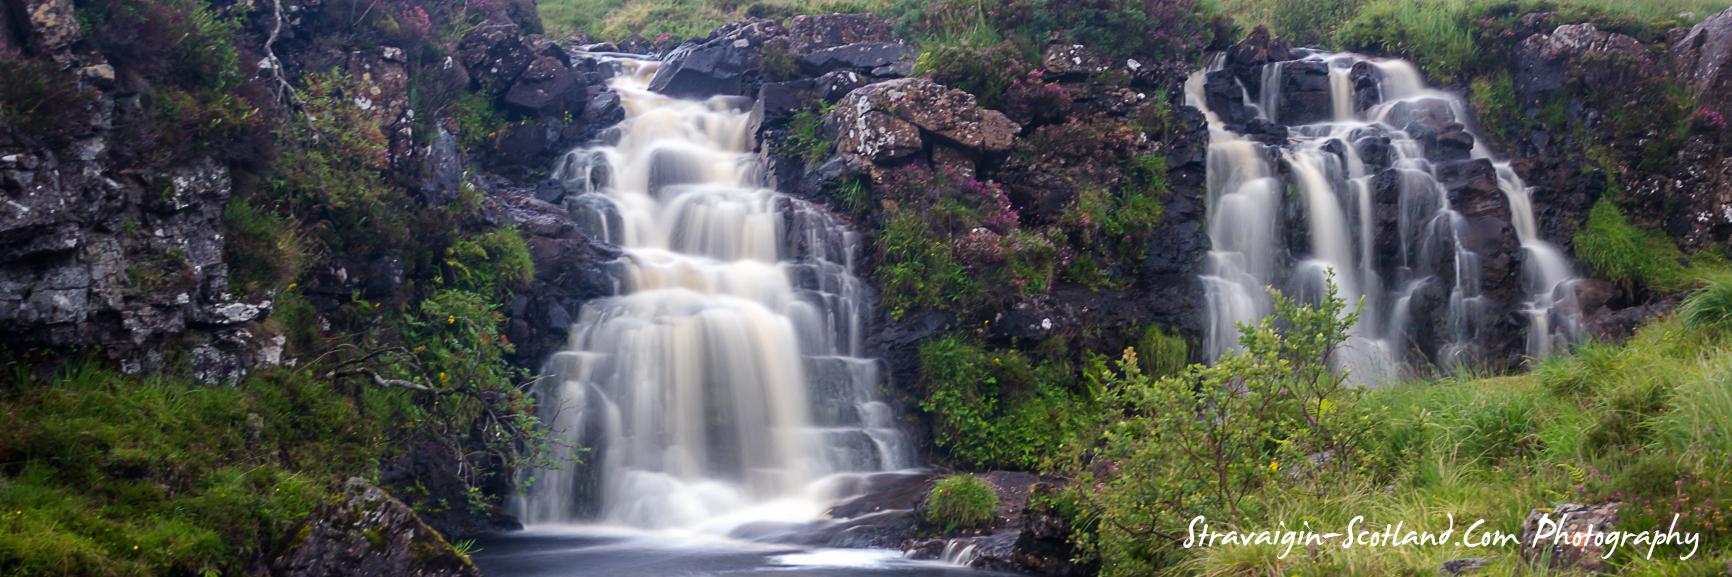 3 Day - The Isle of Skye